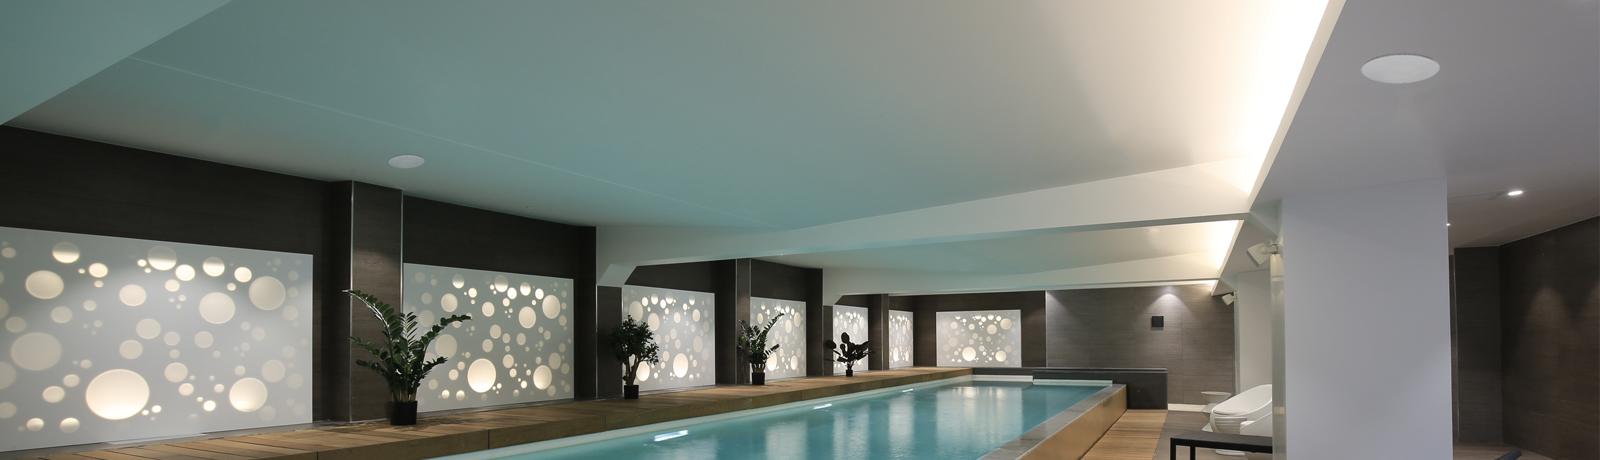 Lw Swimming Pool2